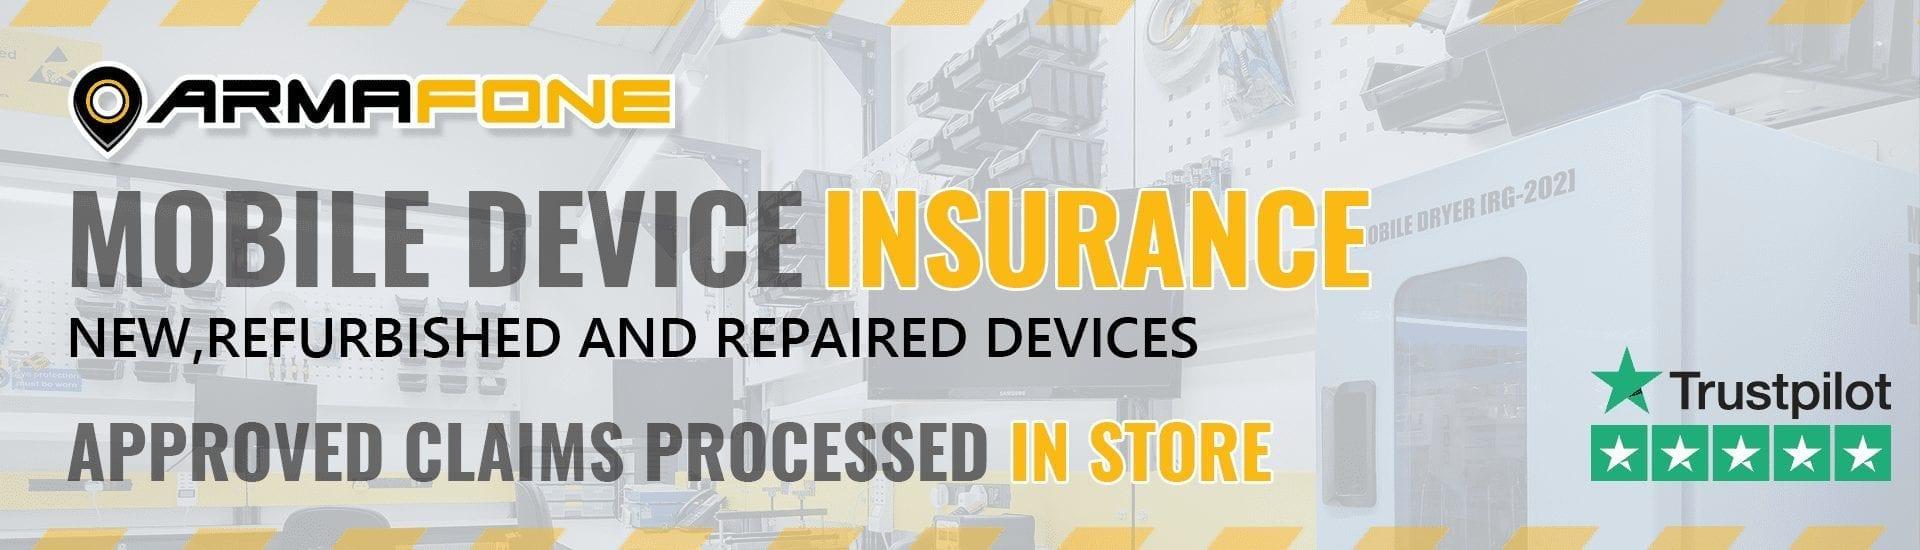 Armafone mobile phone insurance image 1